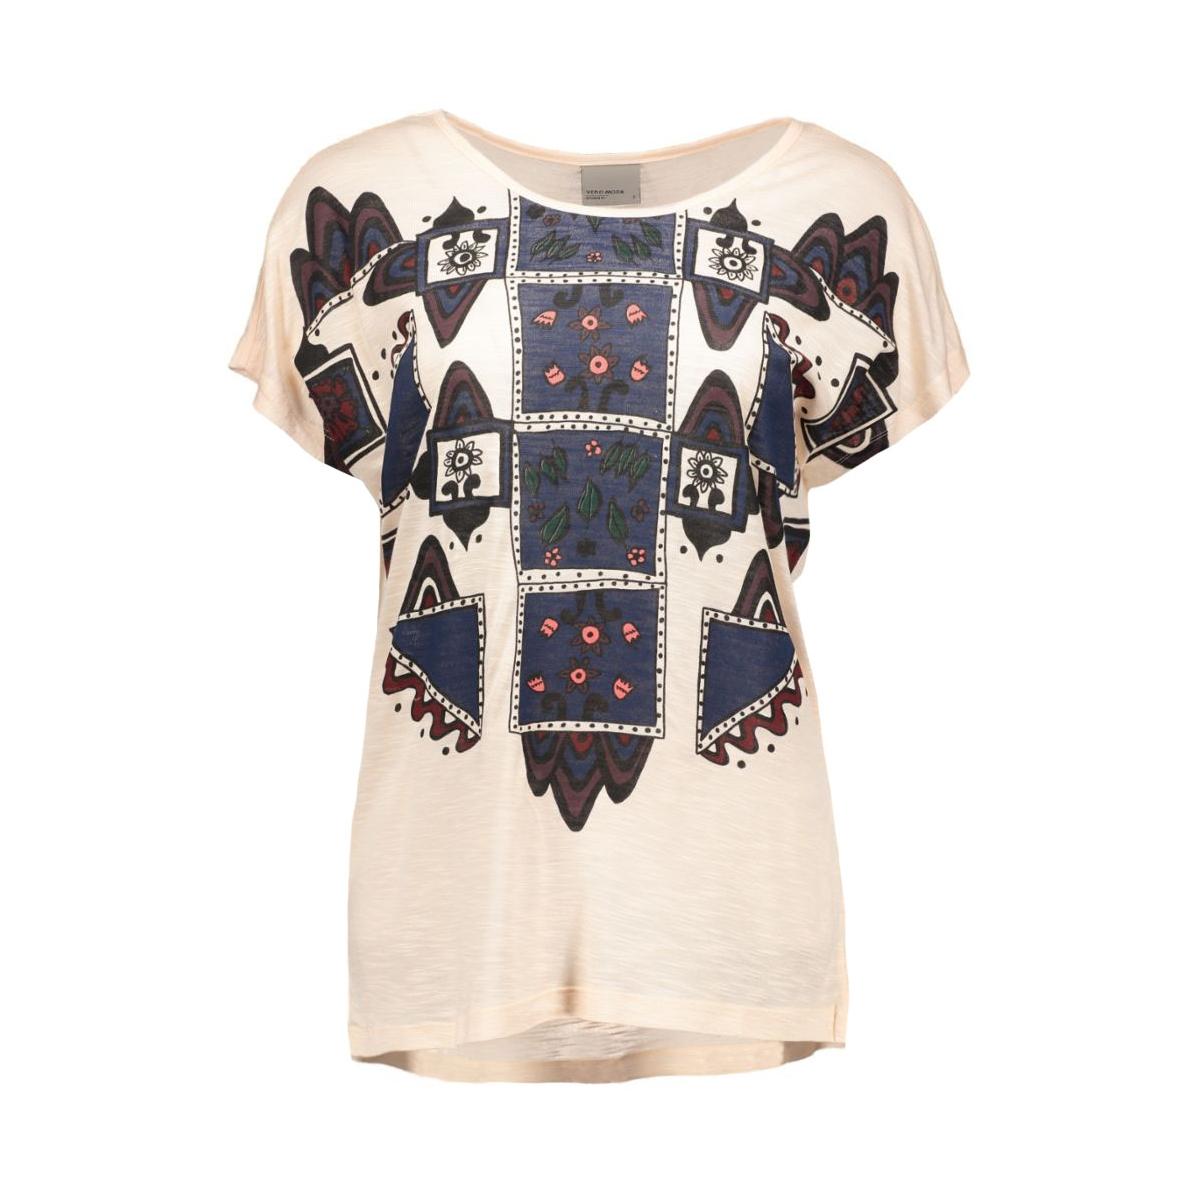 vmgeo luna s/s midi top d2-6 a  10162772 vero moda t-shirt cream tan/woodstock